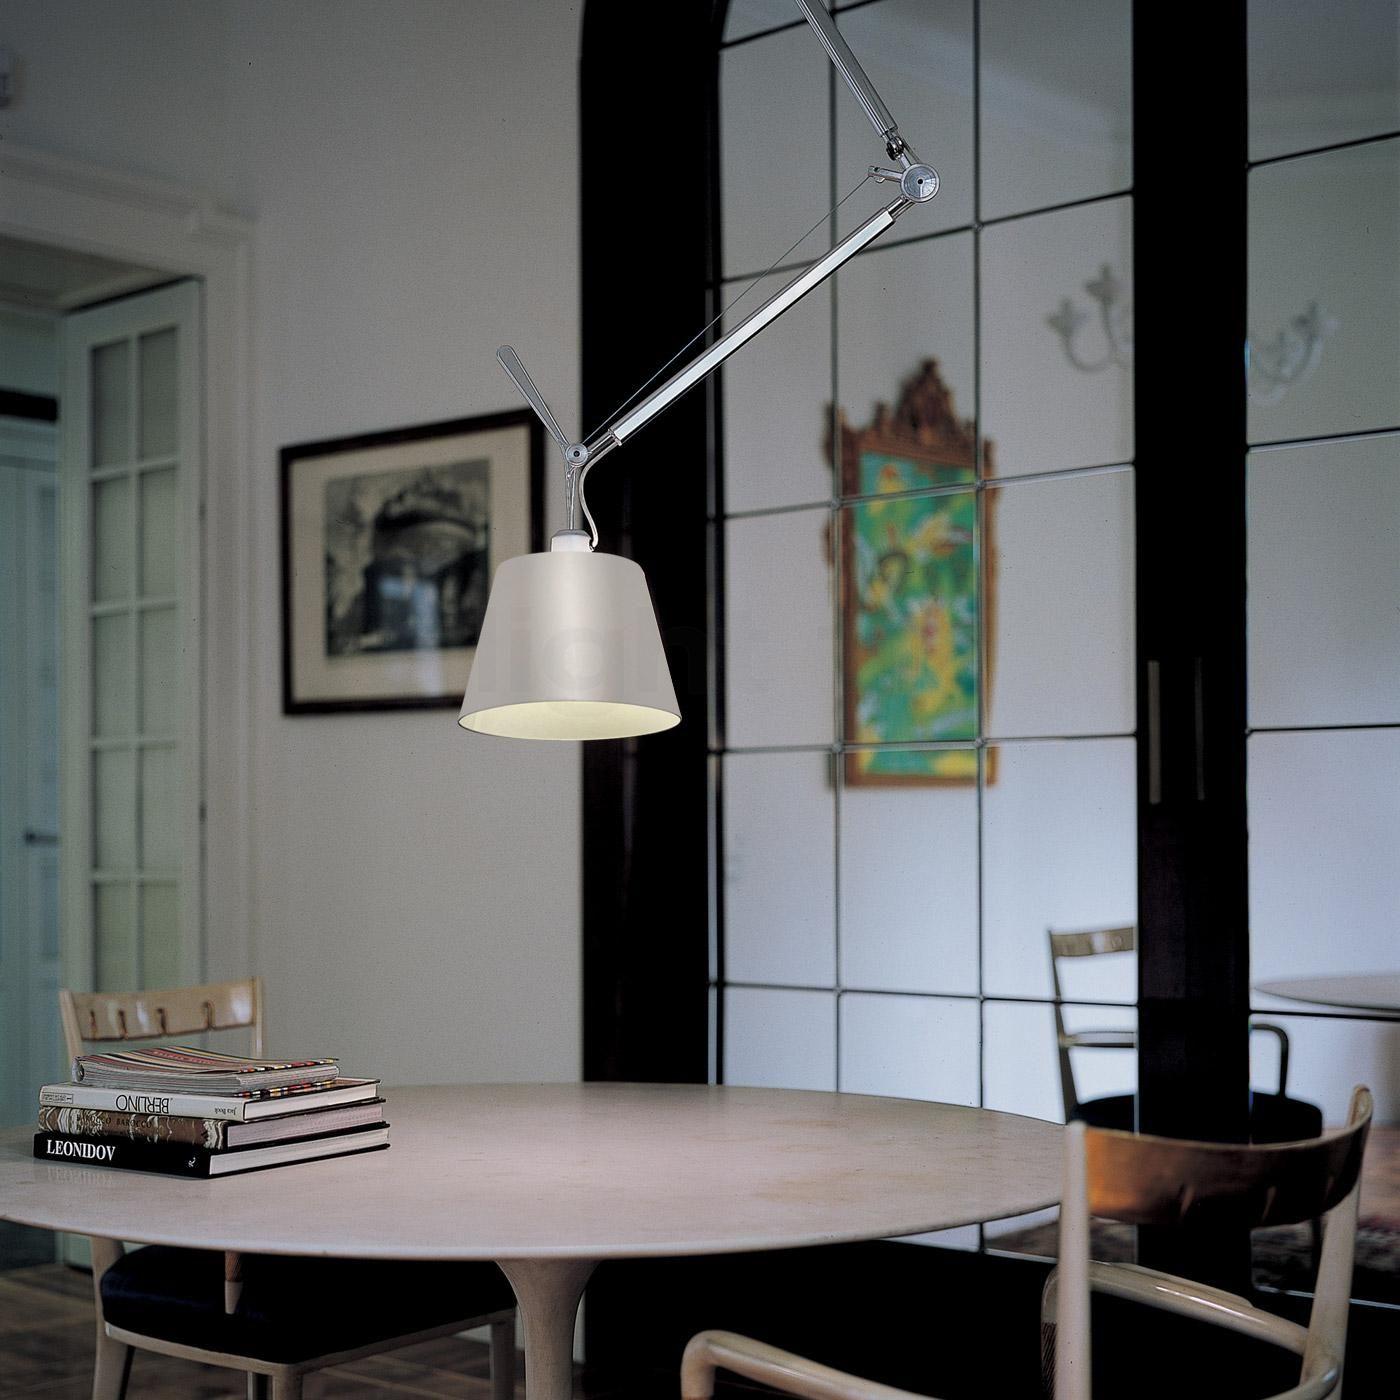 Artemide Tolomeo Sospensione Decentrata - Hanglampen   lampen ...